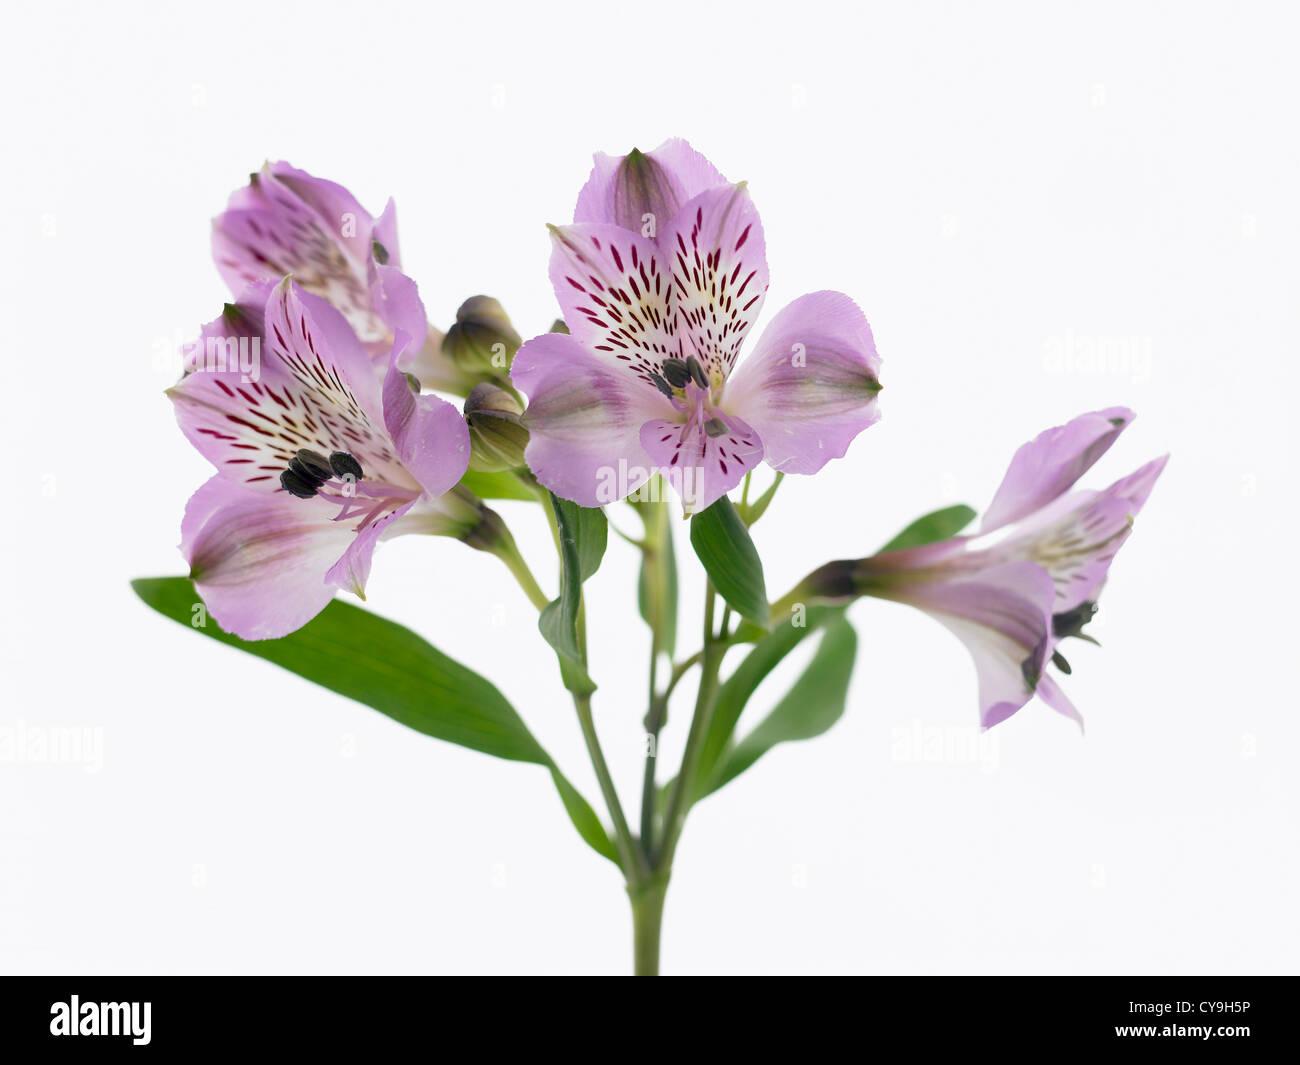 White flowers on single stem against a white background cutout stock alstroemeria cultivar peruvian lily purple flowers on a single stem against a white background mightylinksfo